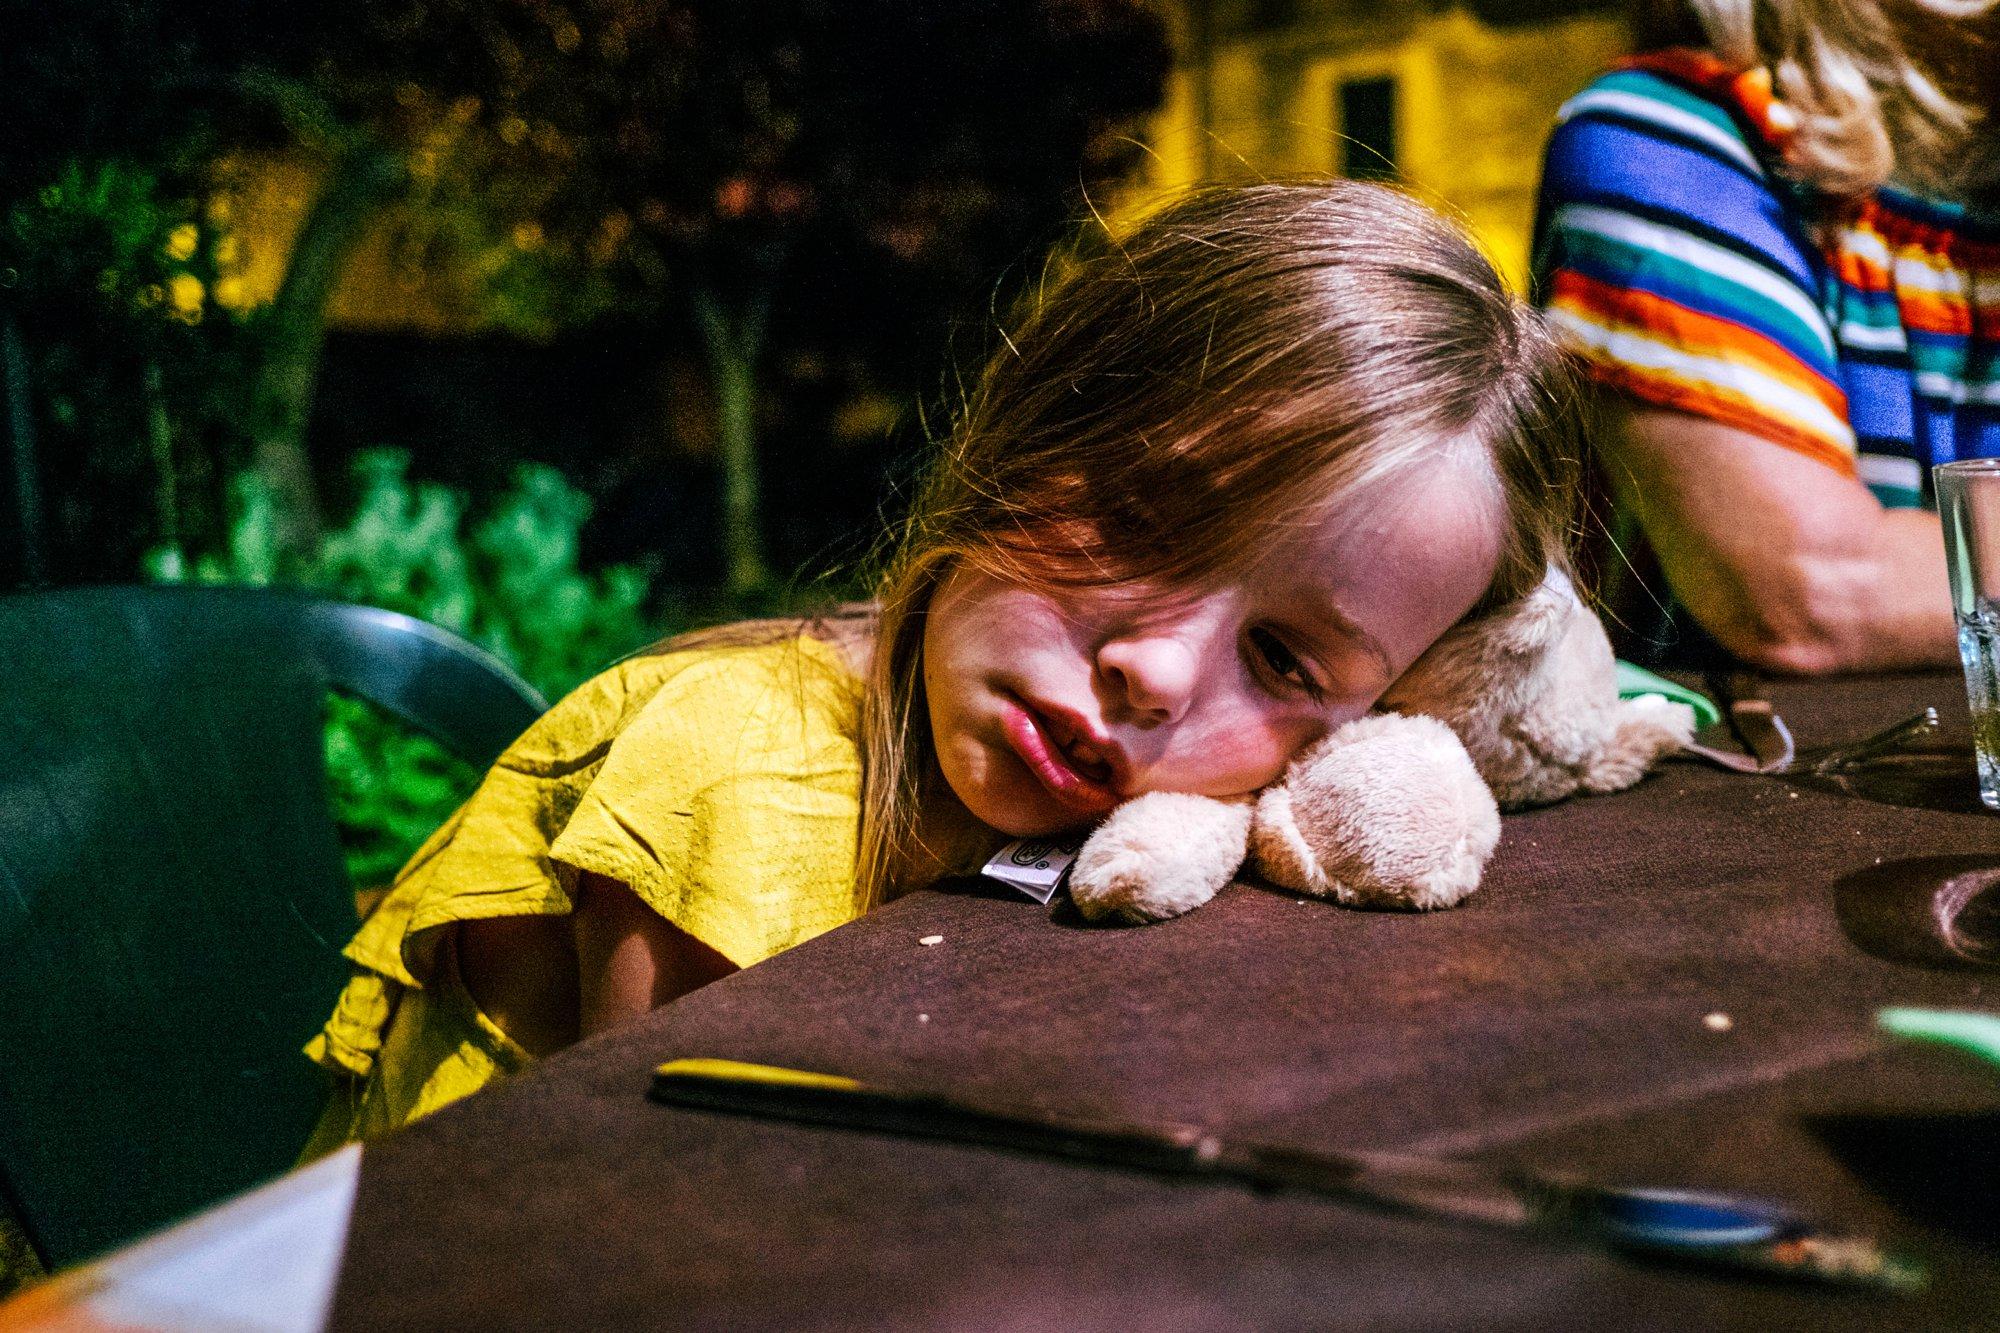 Little girl asleep at dinner table Essex Documentary Travel Wedding Family Photographer